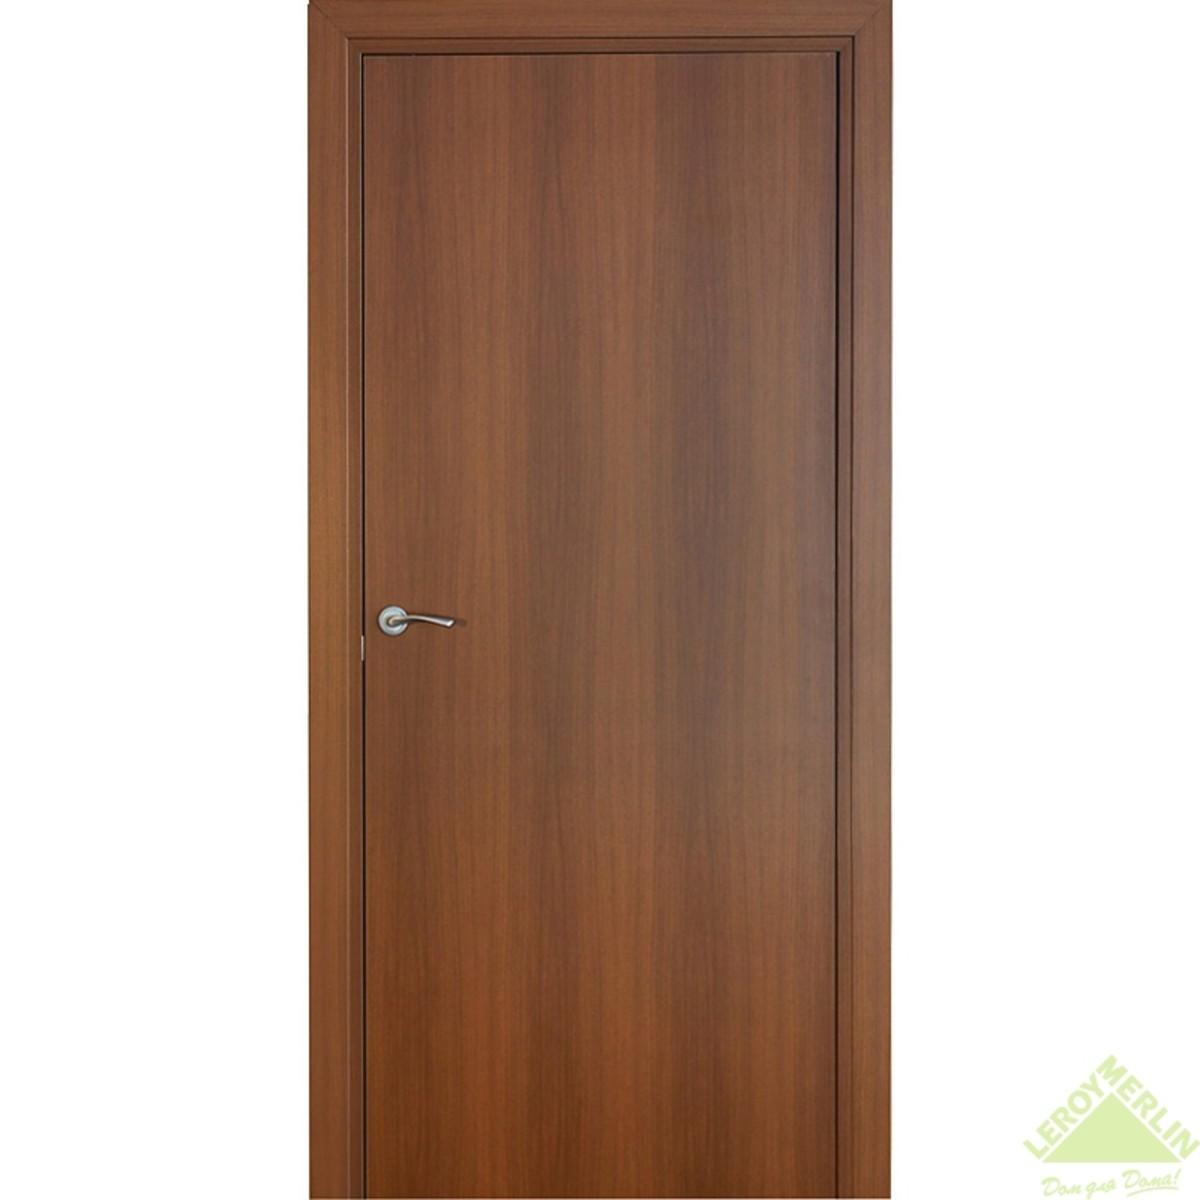 Дверь Межкомнатная Глухая Фортунато 80x200 Ламинация Цвет Орех